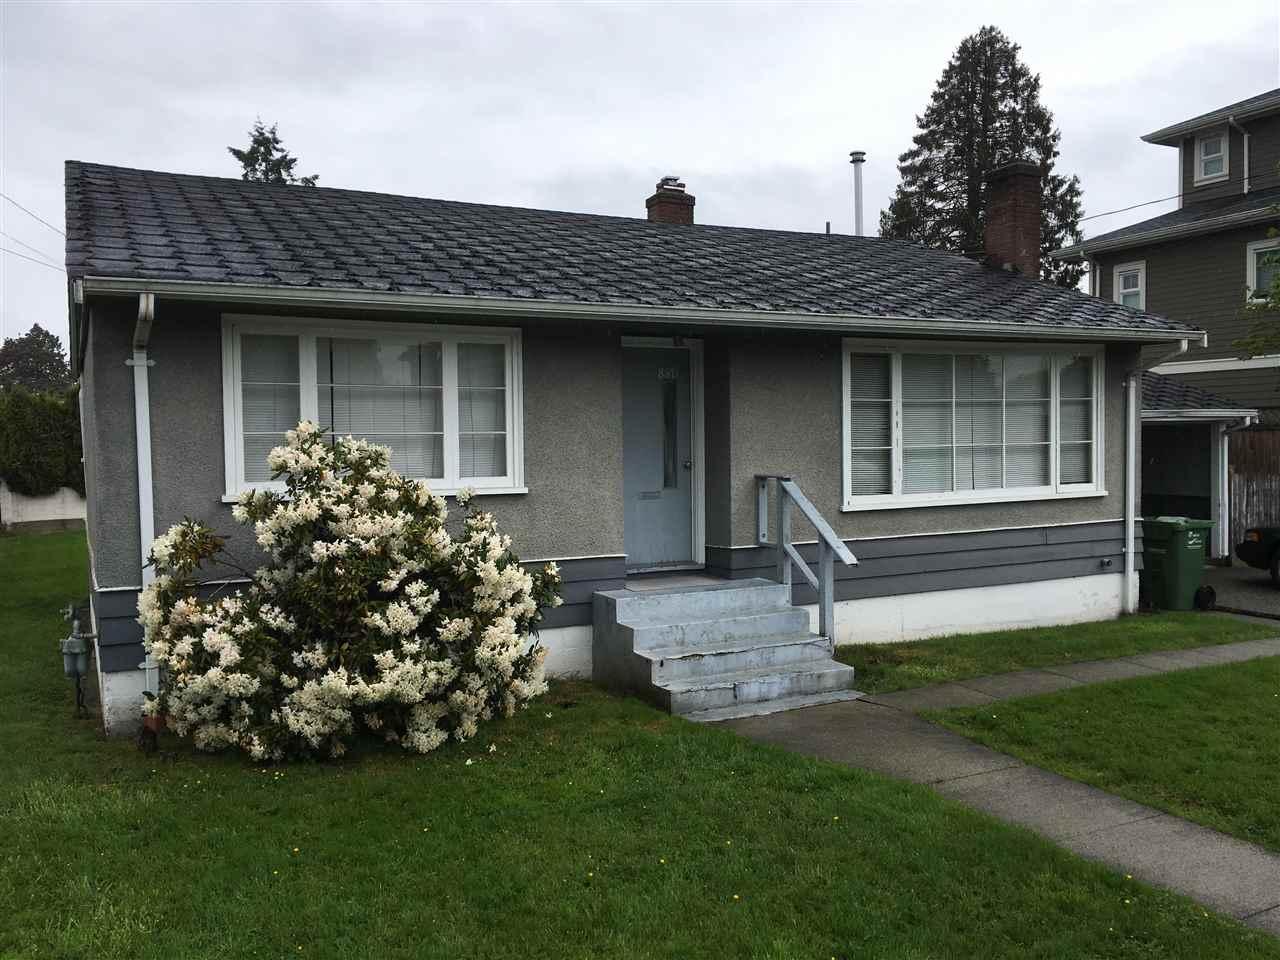 8371 WILLIAMS ROAD, Richmond, BC, V7A 1G7 Primary Photo